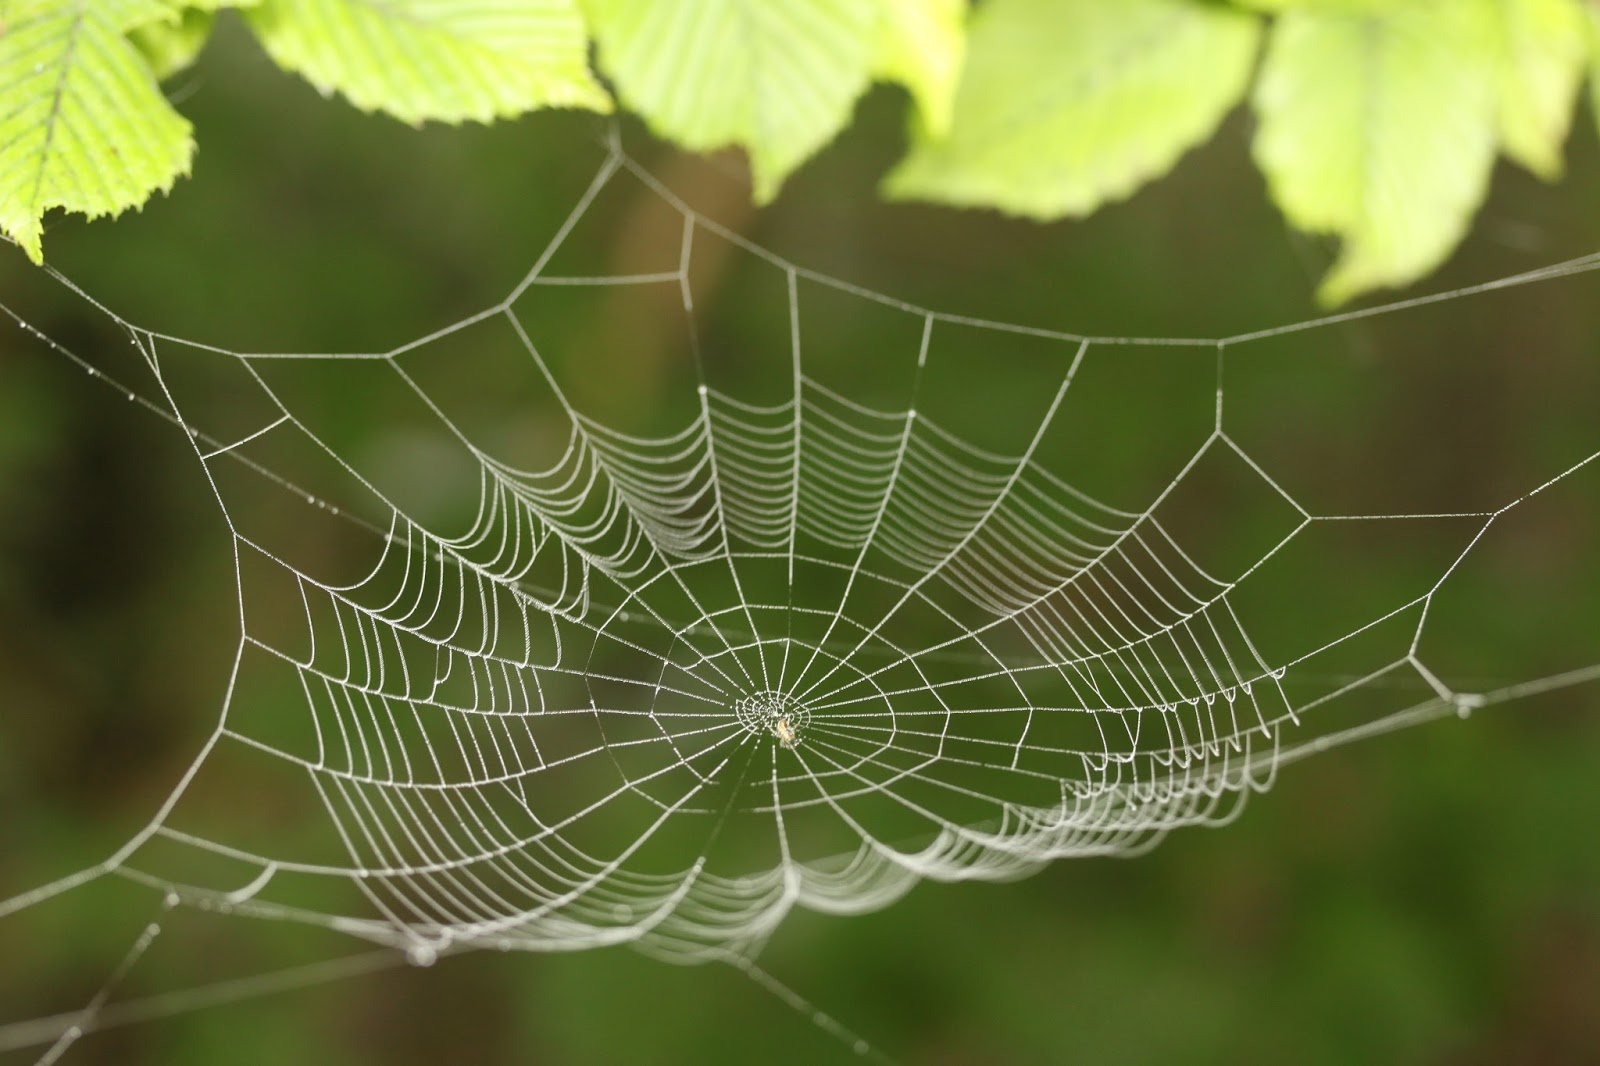 An amazing design of a cobweb.